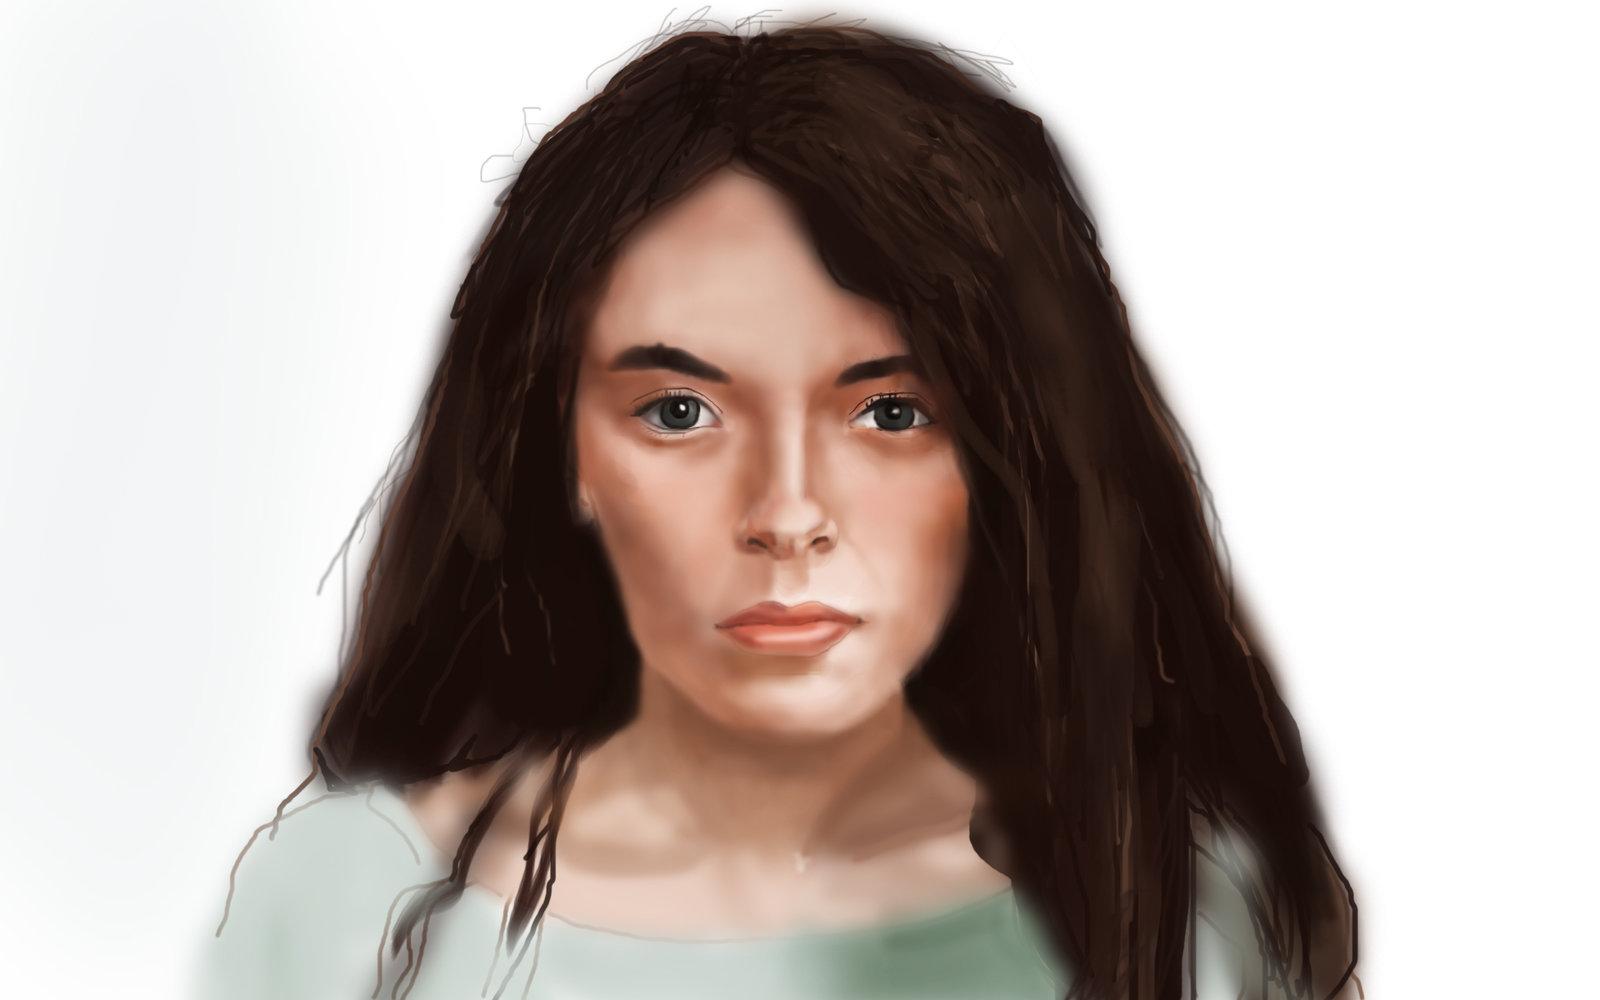 портрет2-1.jpg